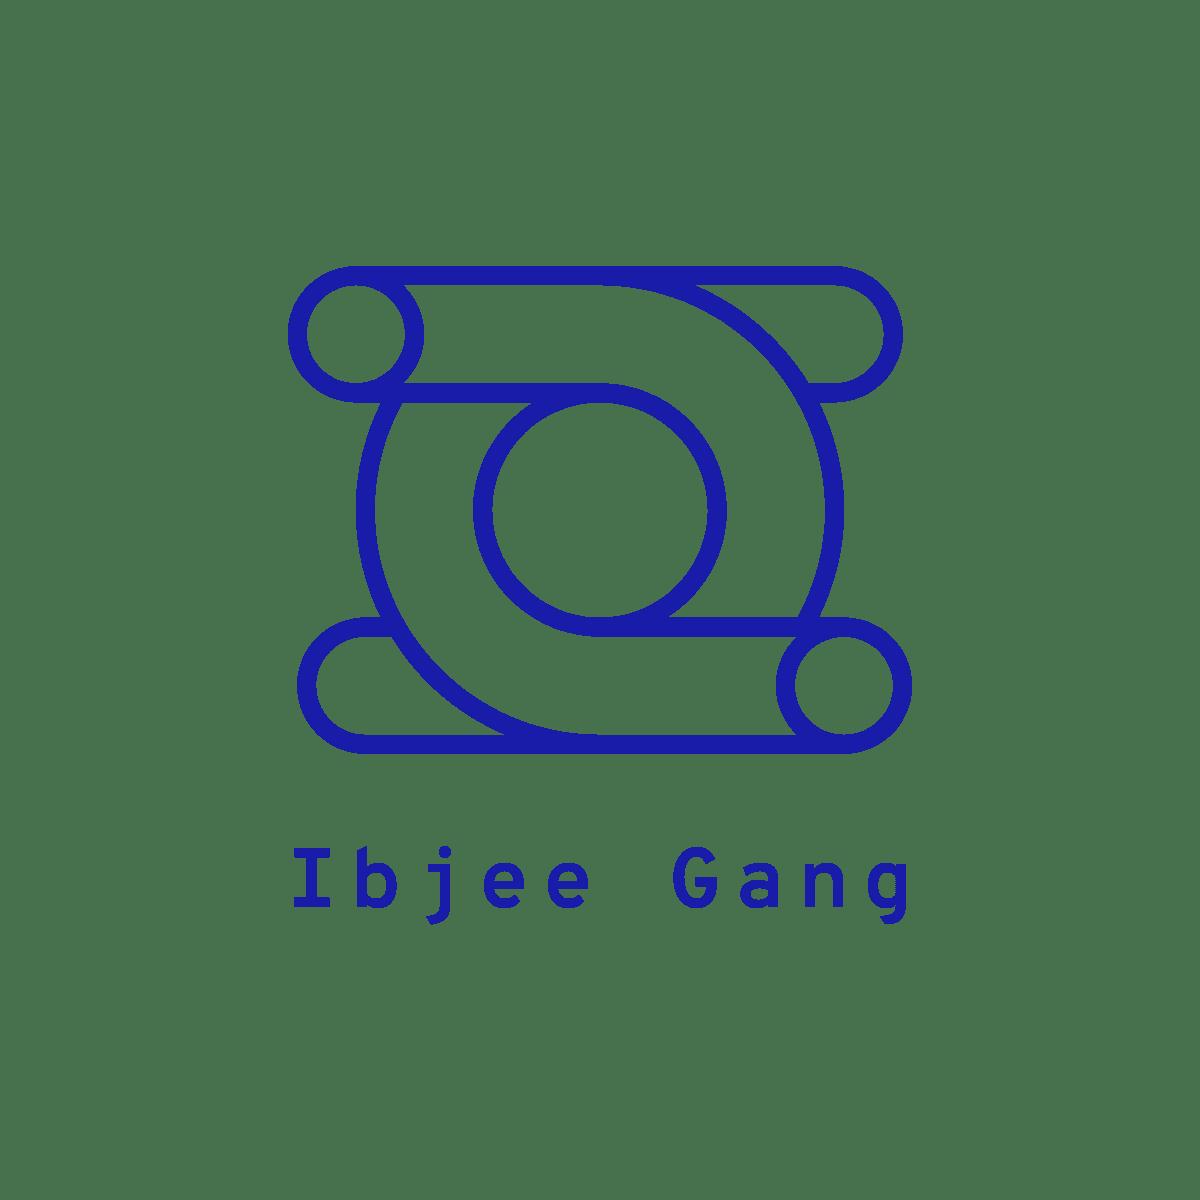 Ibjeegang